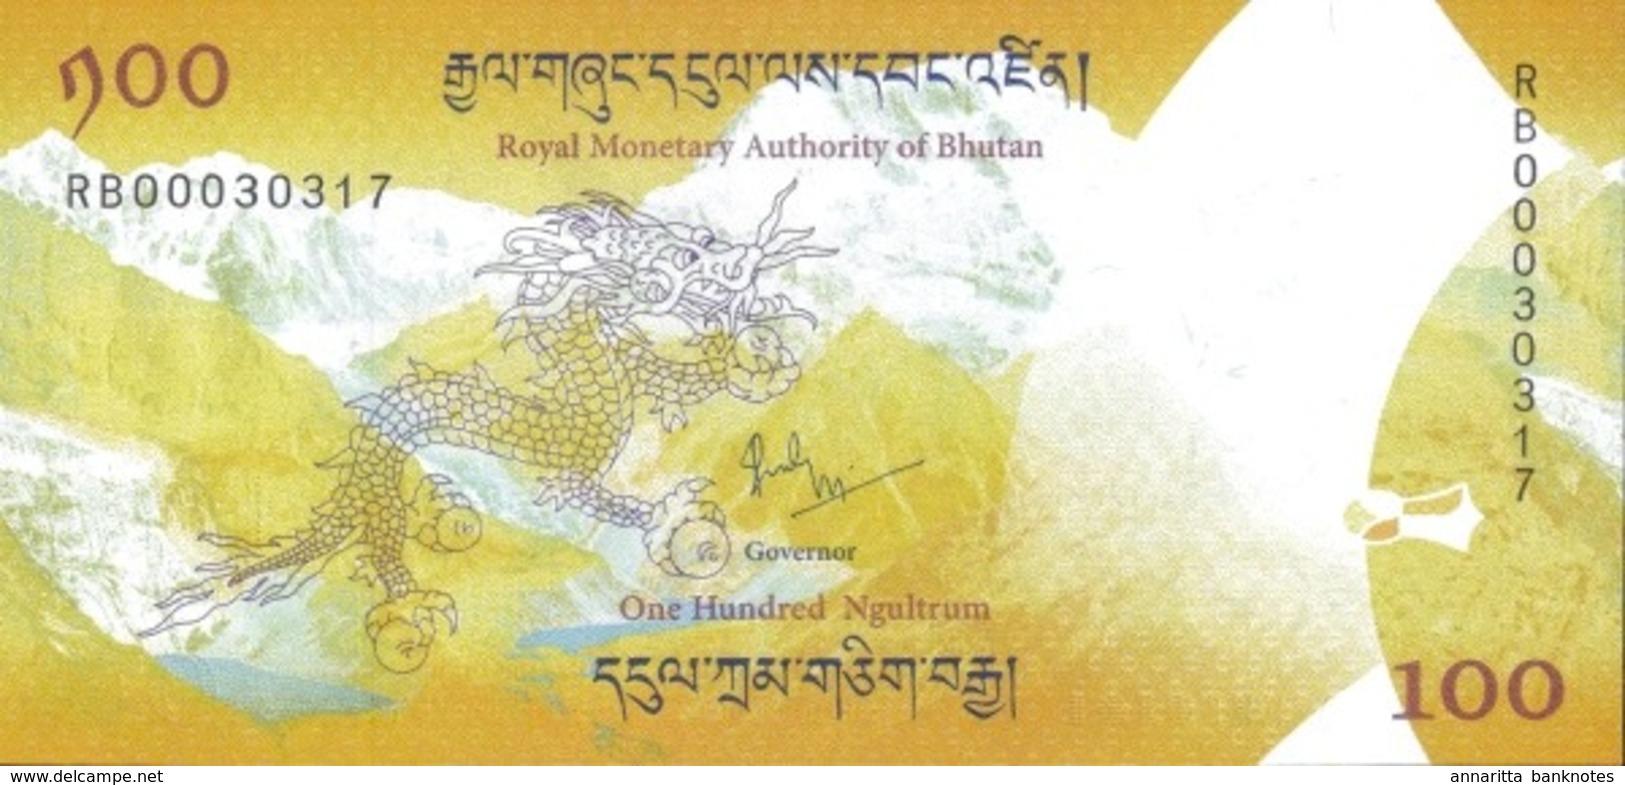 BHUTAN 100 NGULTRUM 2016 (2018) P-37a UNC COMMEMORATIVE W/ FOLDER [BTNP202a] - Bhutan